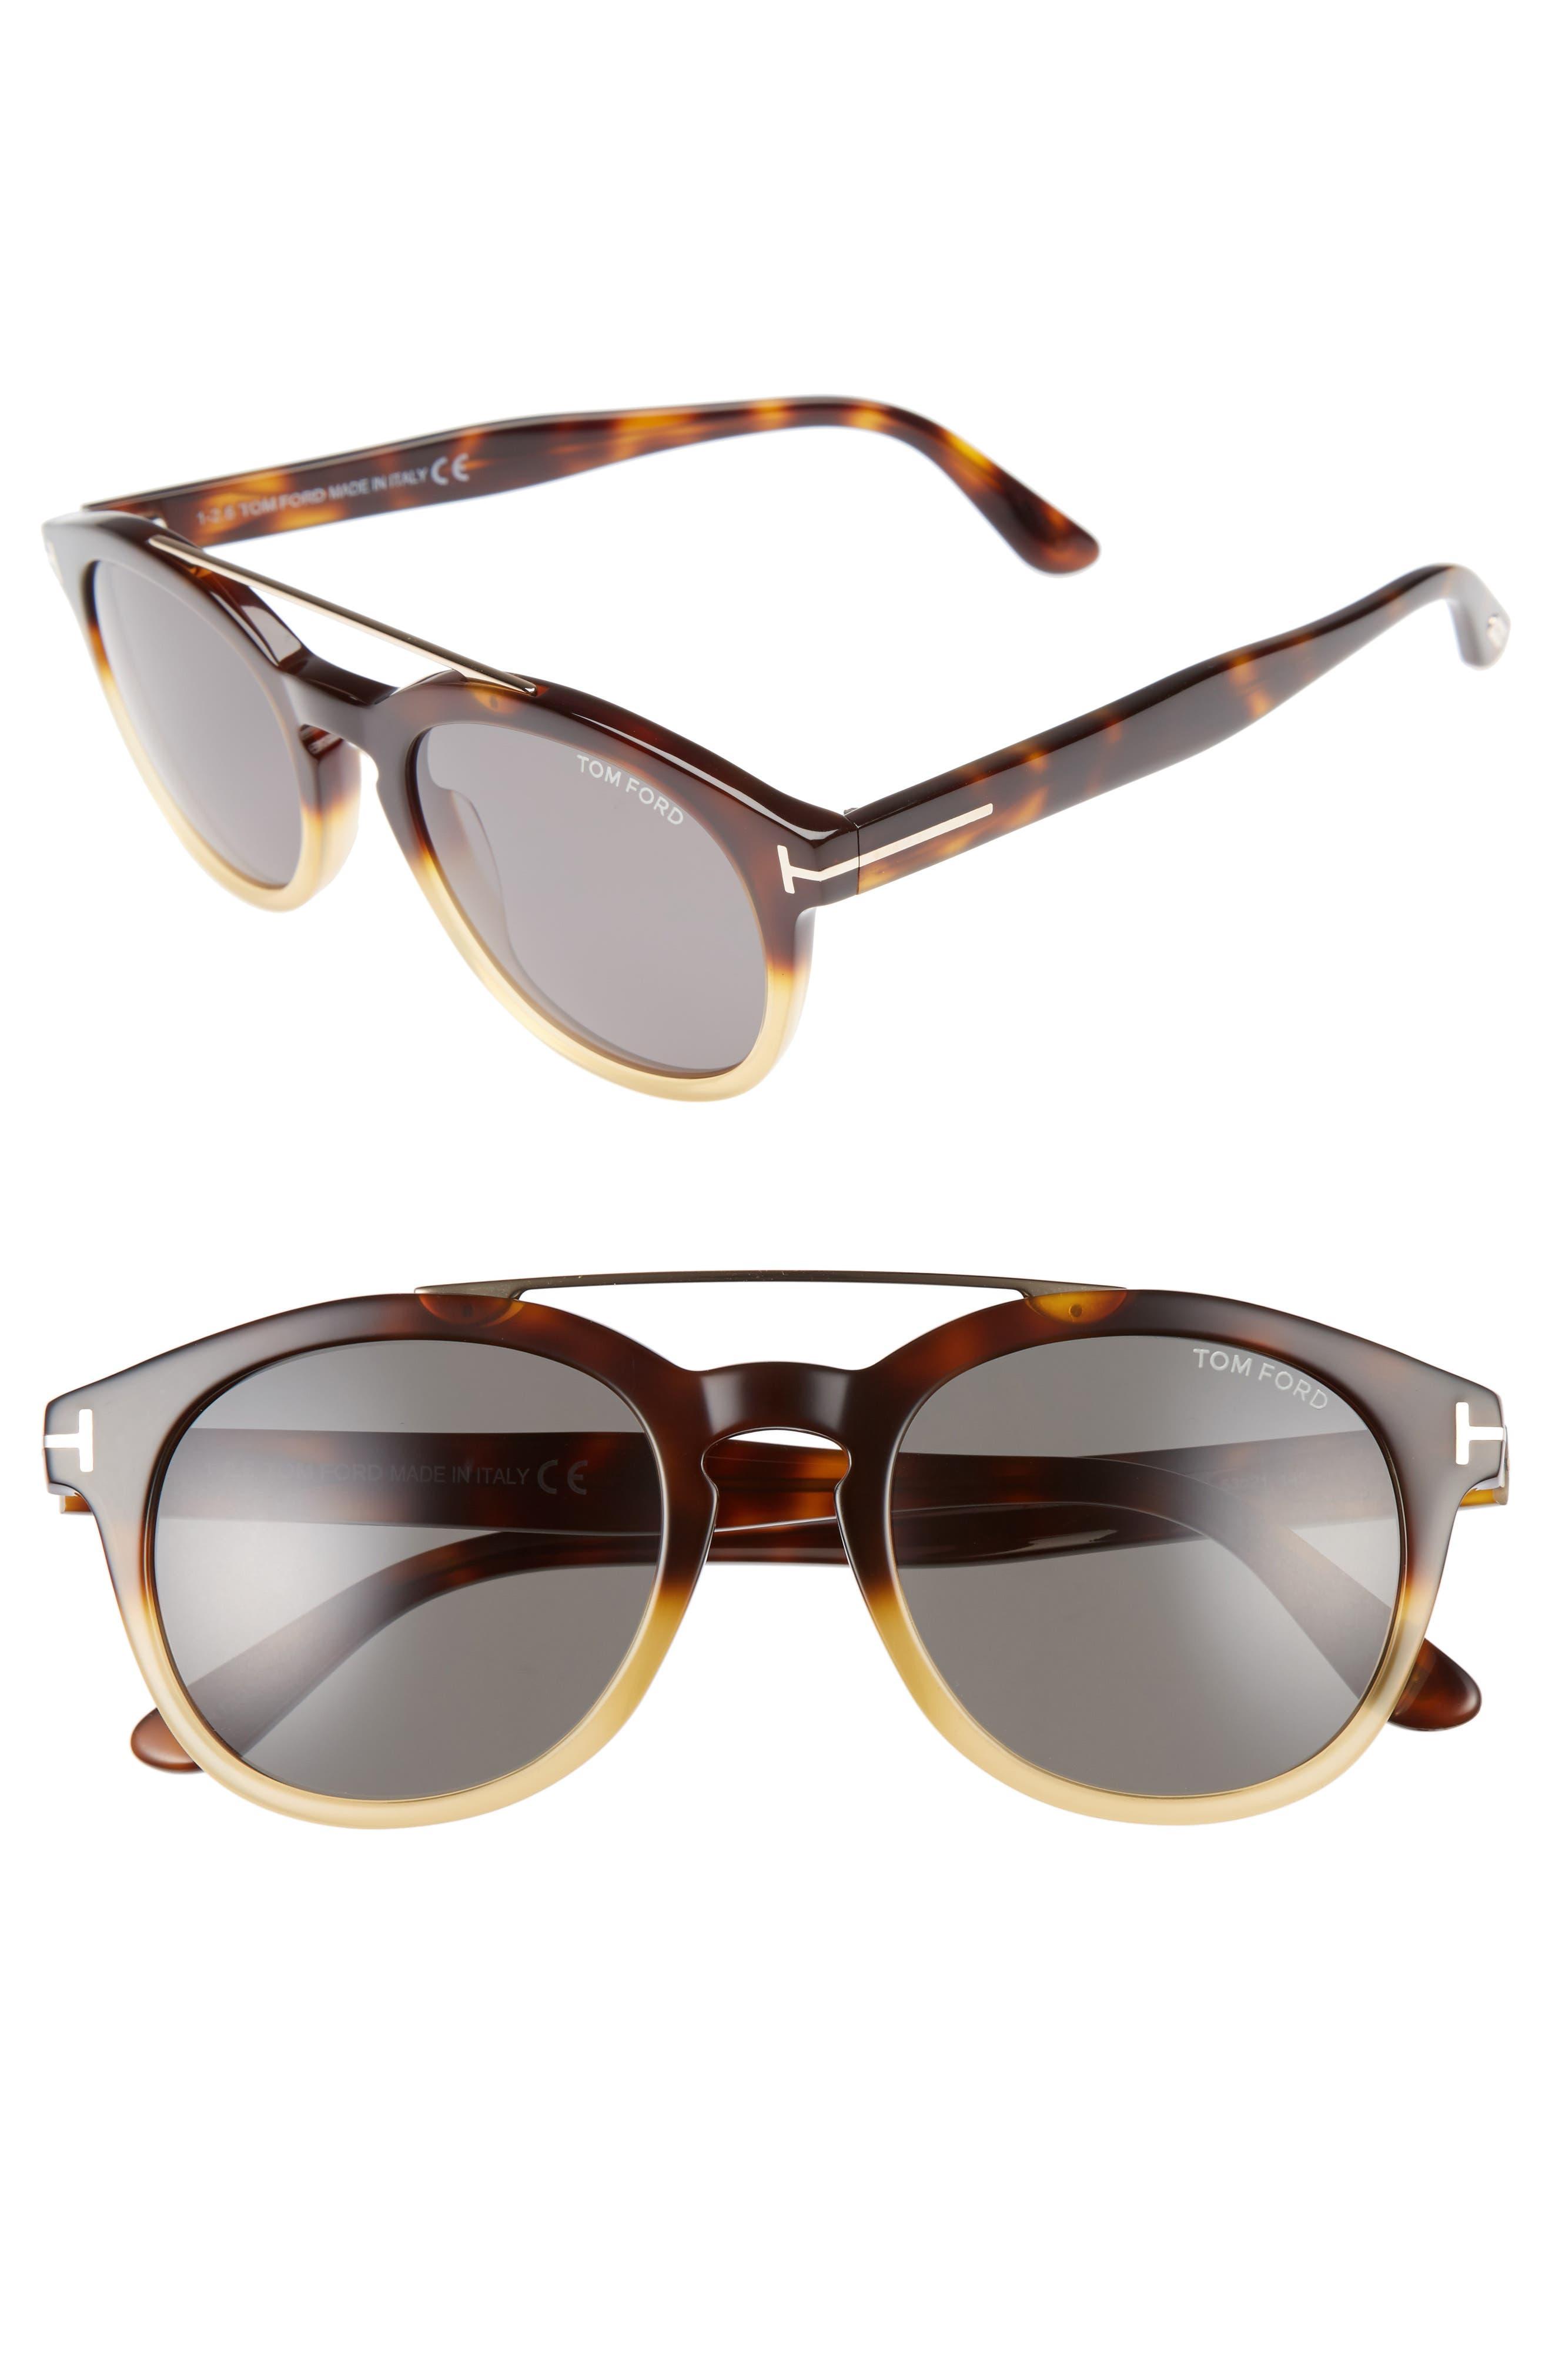 Newman 53mm Polarized Sunglasses,                         Main,                         color, Honey/ Rose Gold/ Green